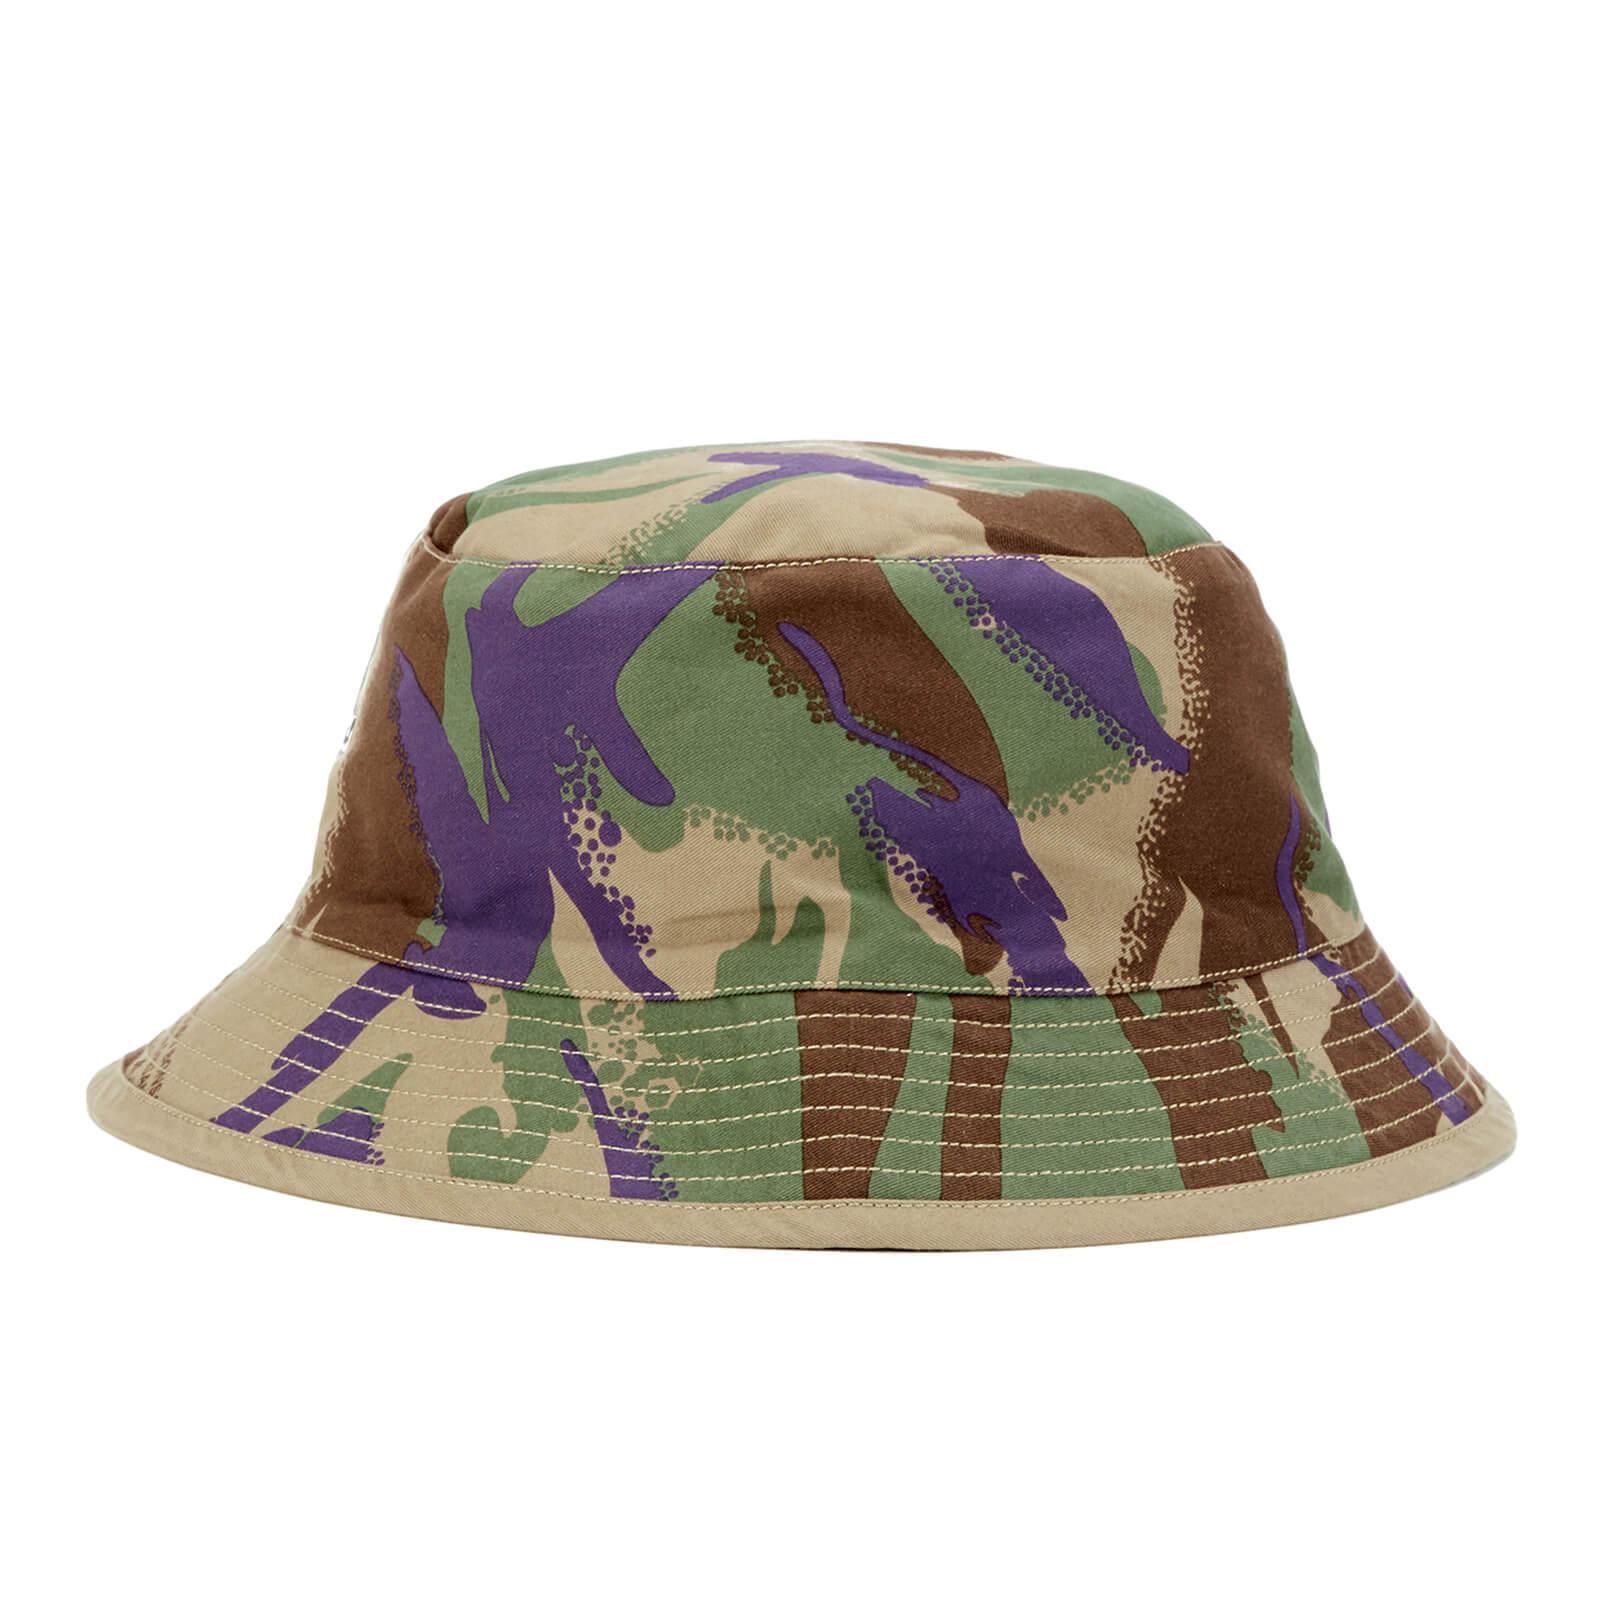 5ec508edfd6 Maharishi Men S Reversible O Bucket Hat Papal Woodland Sand